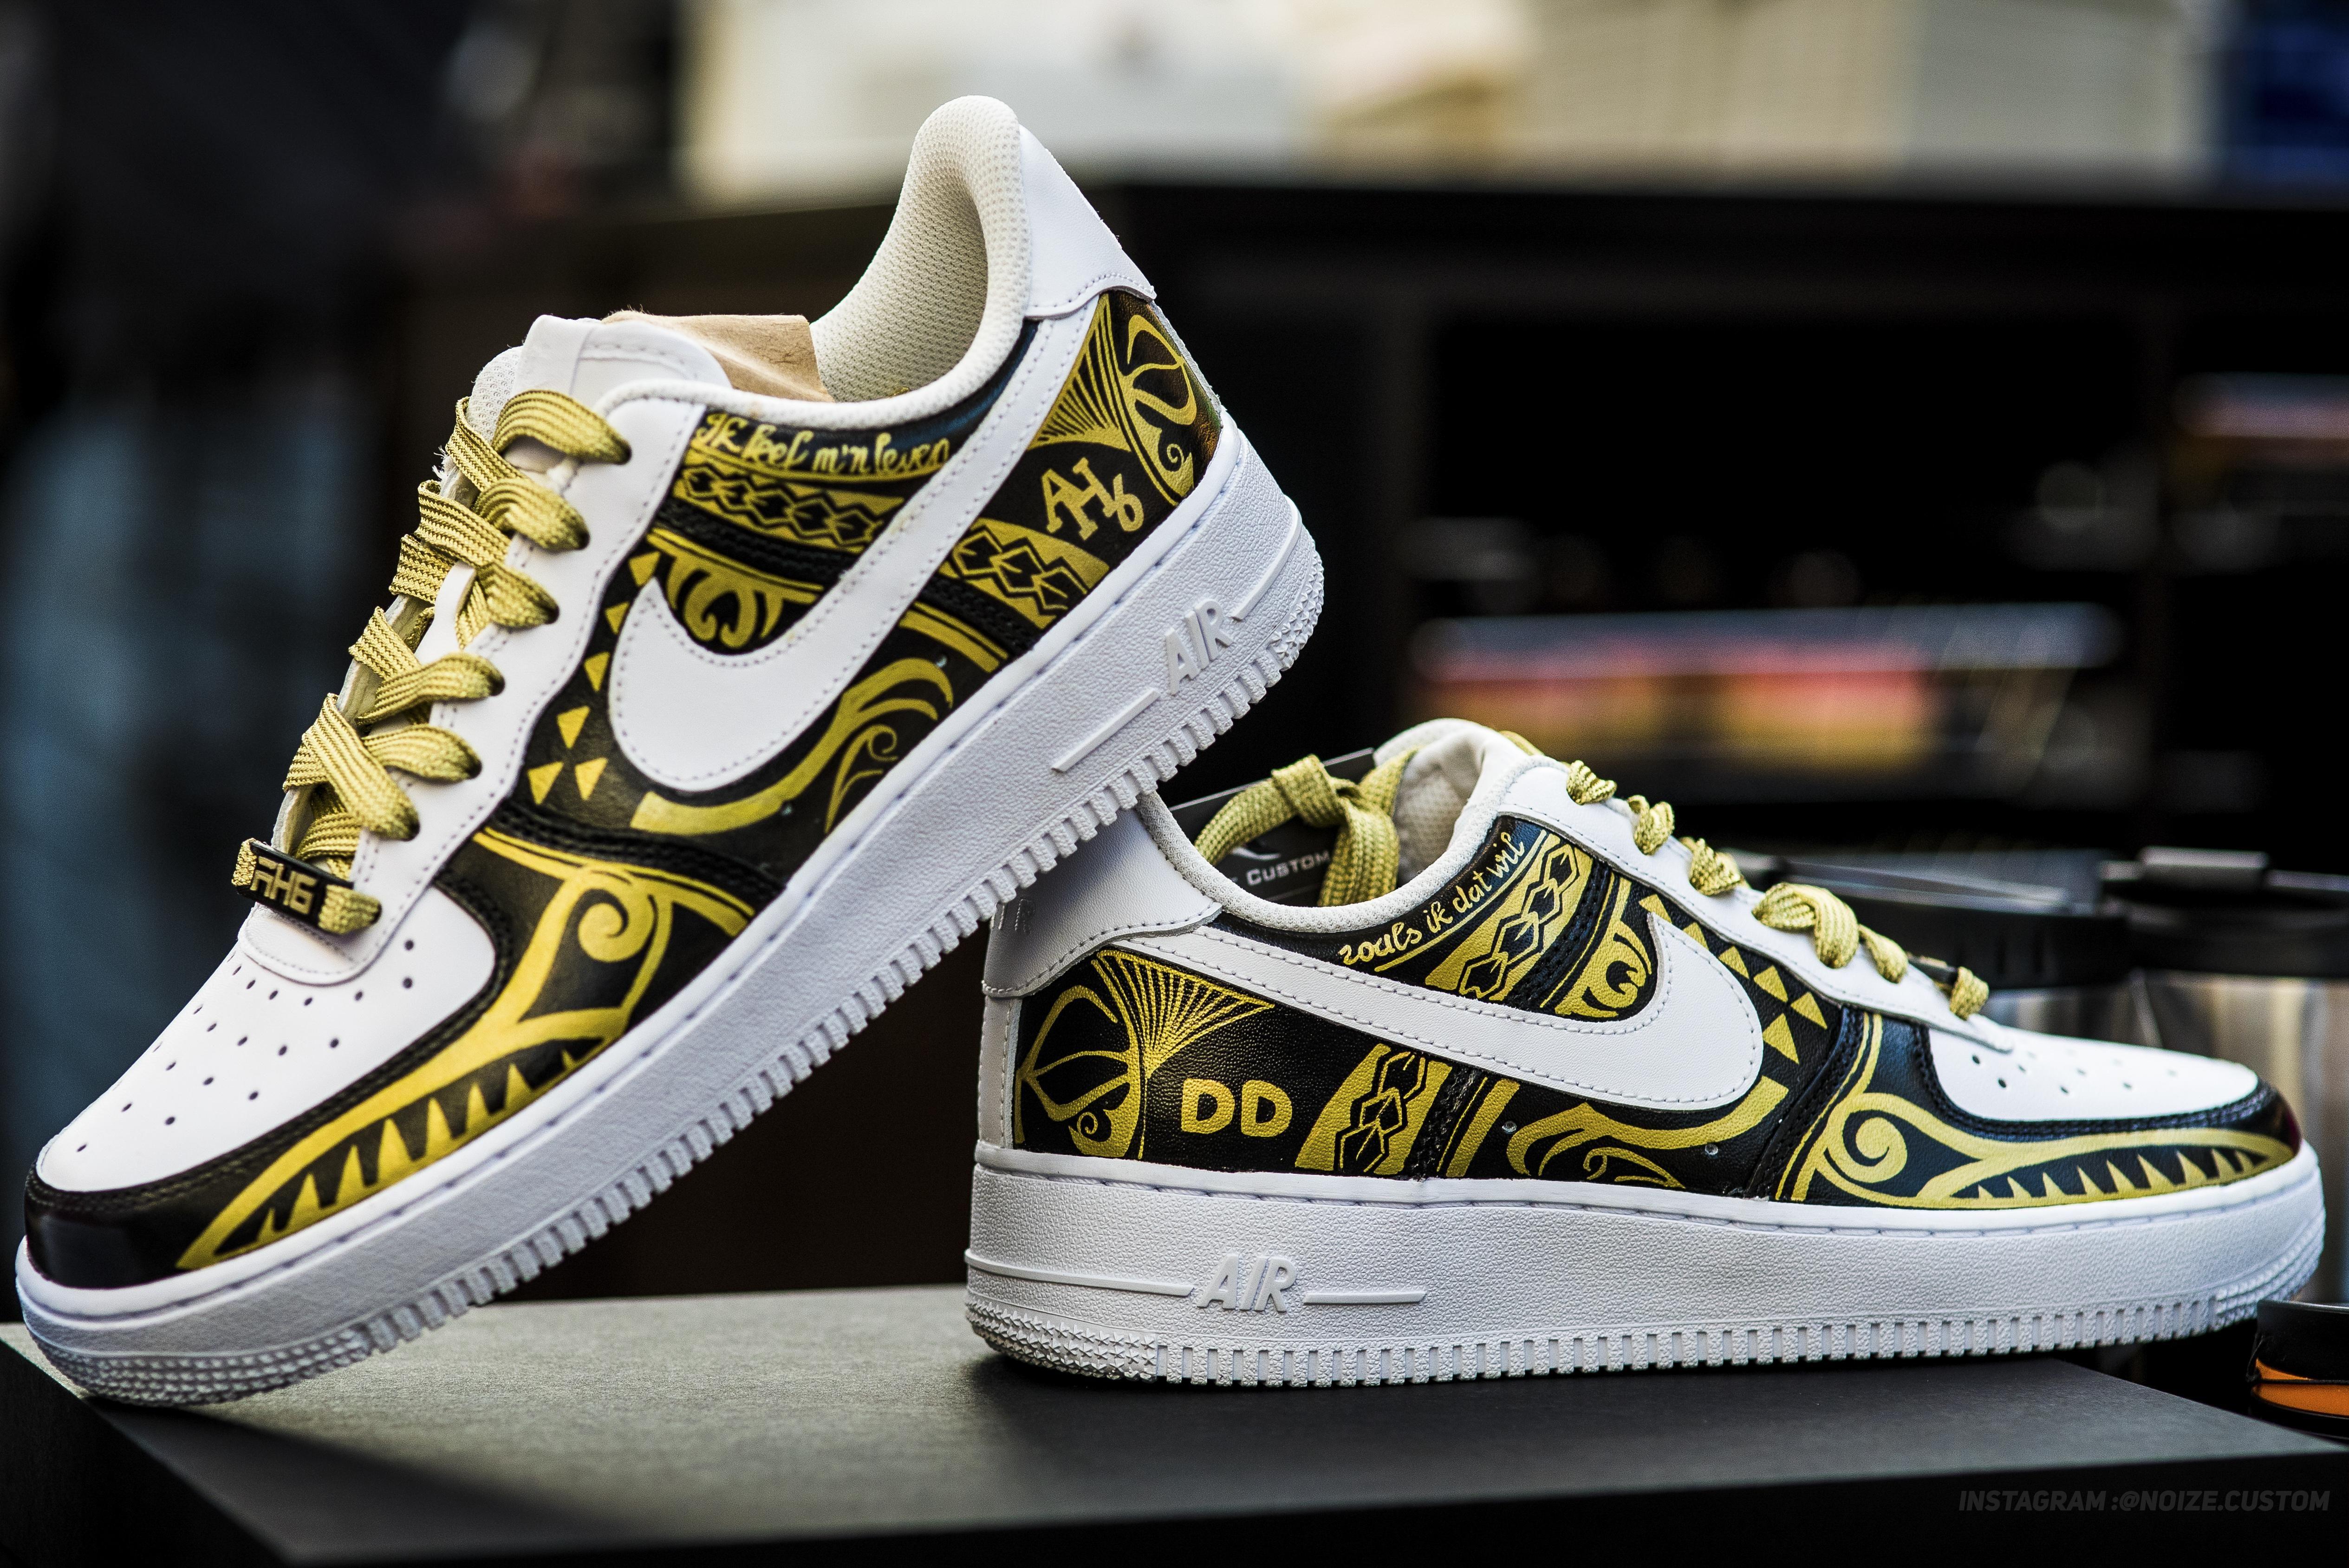 [ART] I Made some custom Nike Air Force 1 sneakers What